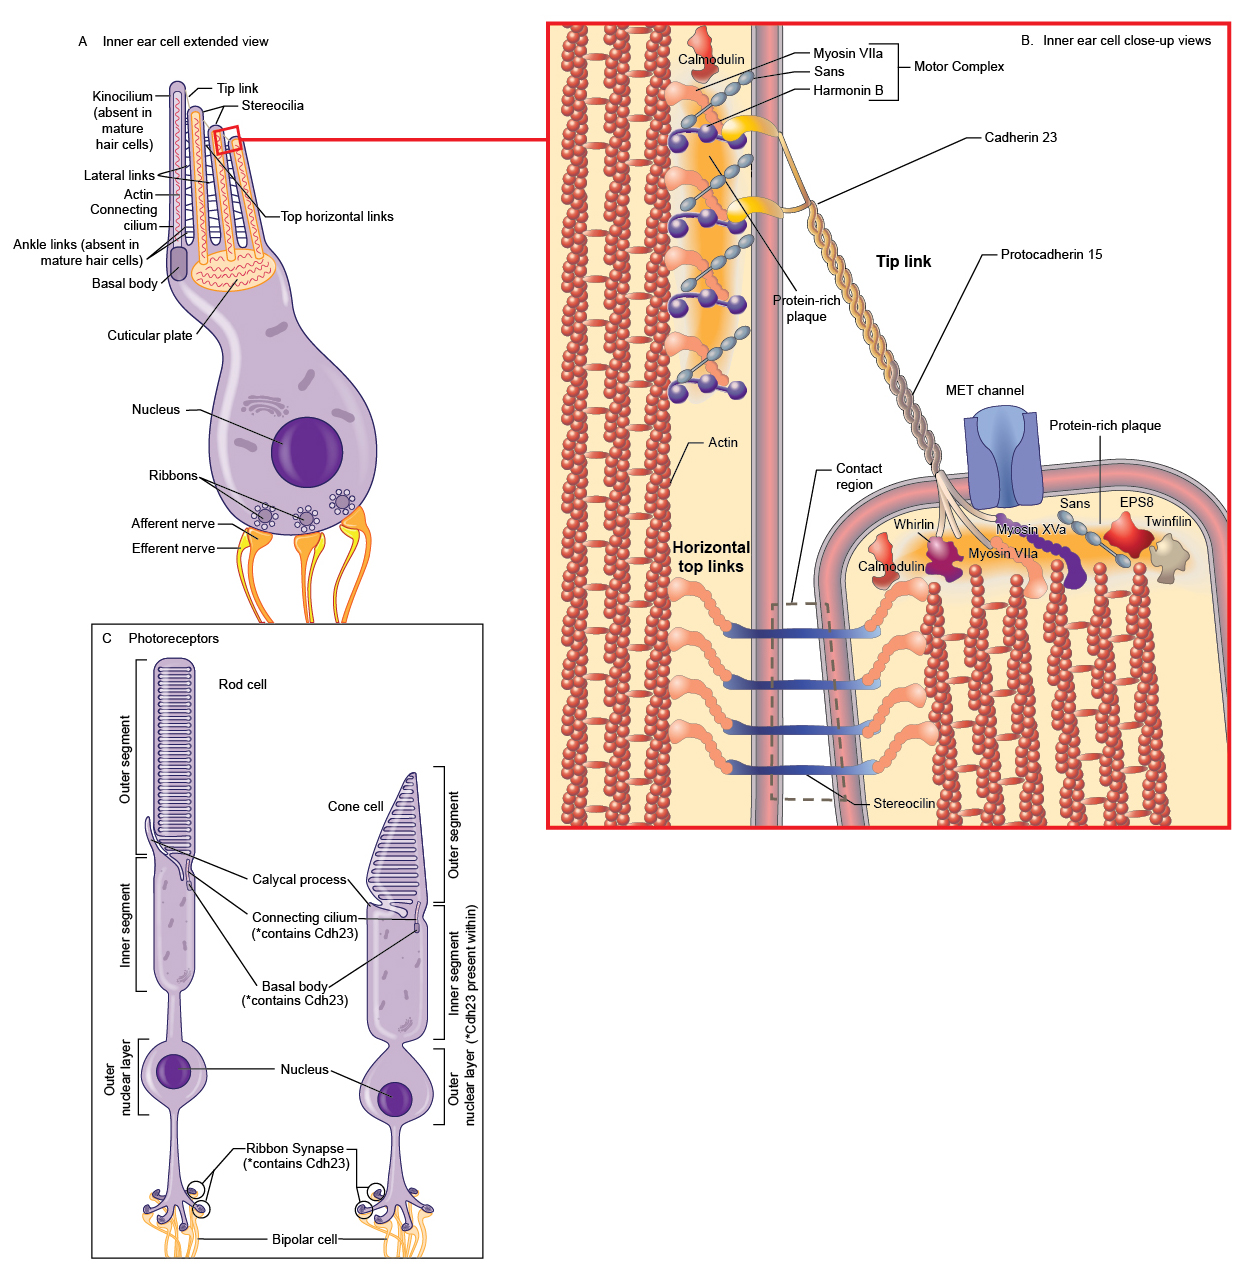 Mouse eye anatomy 9391715 - togelmaya.info